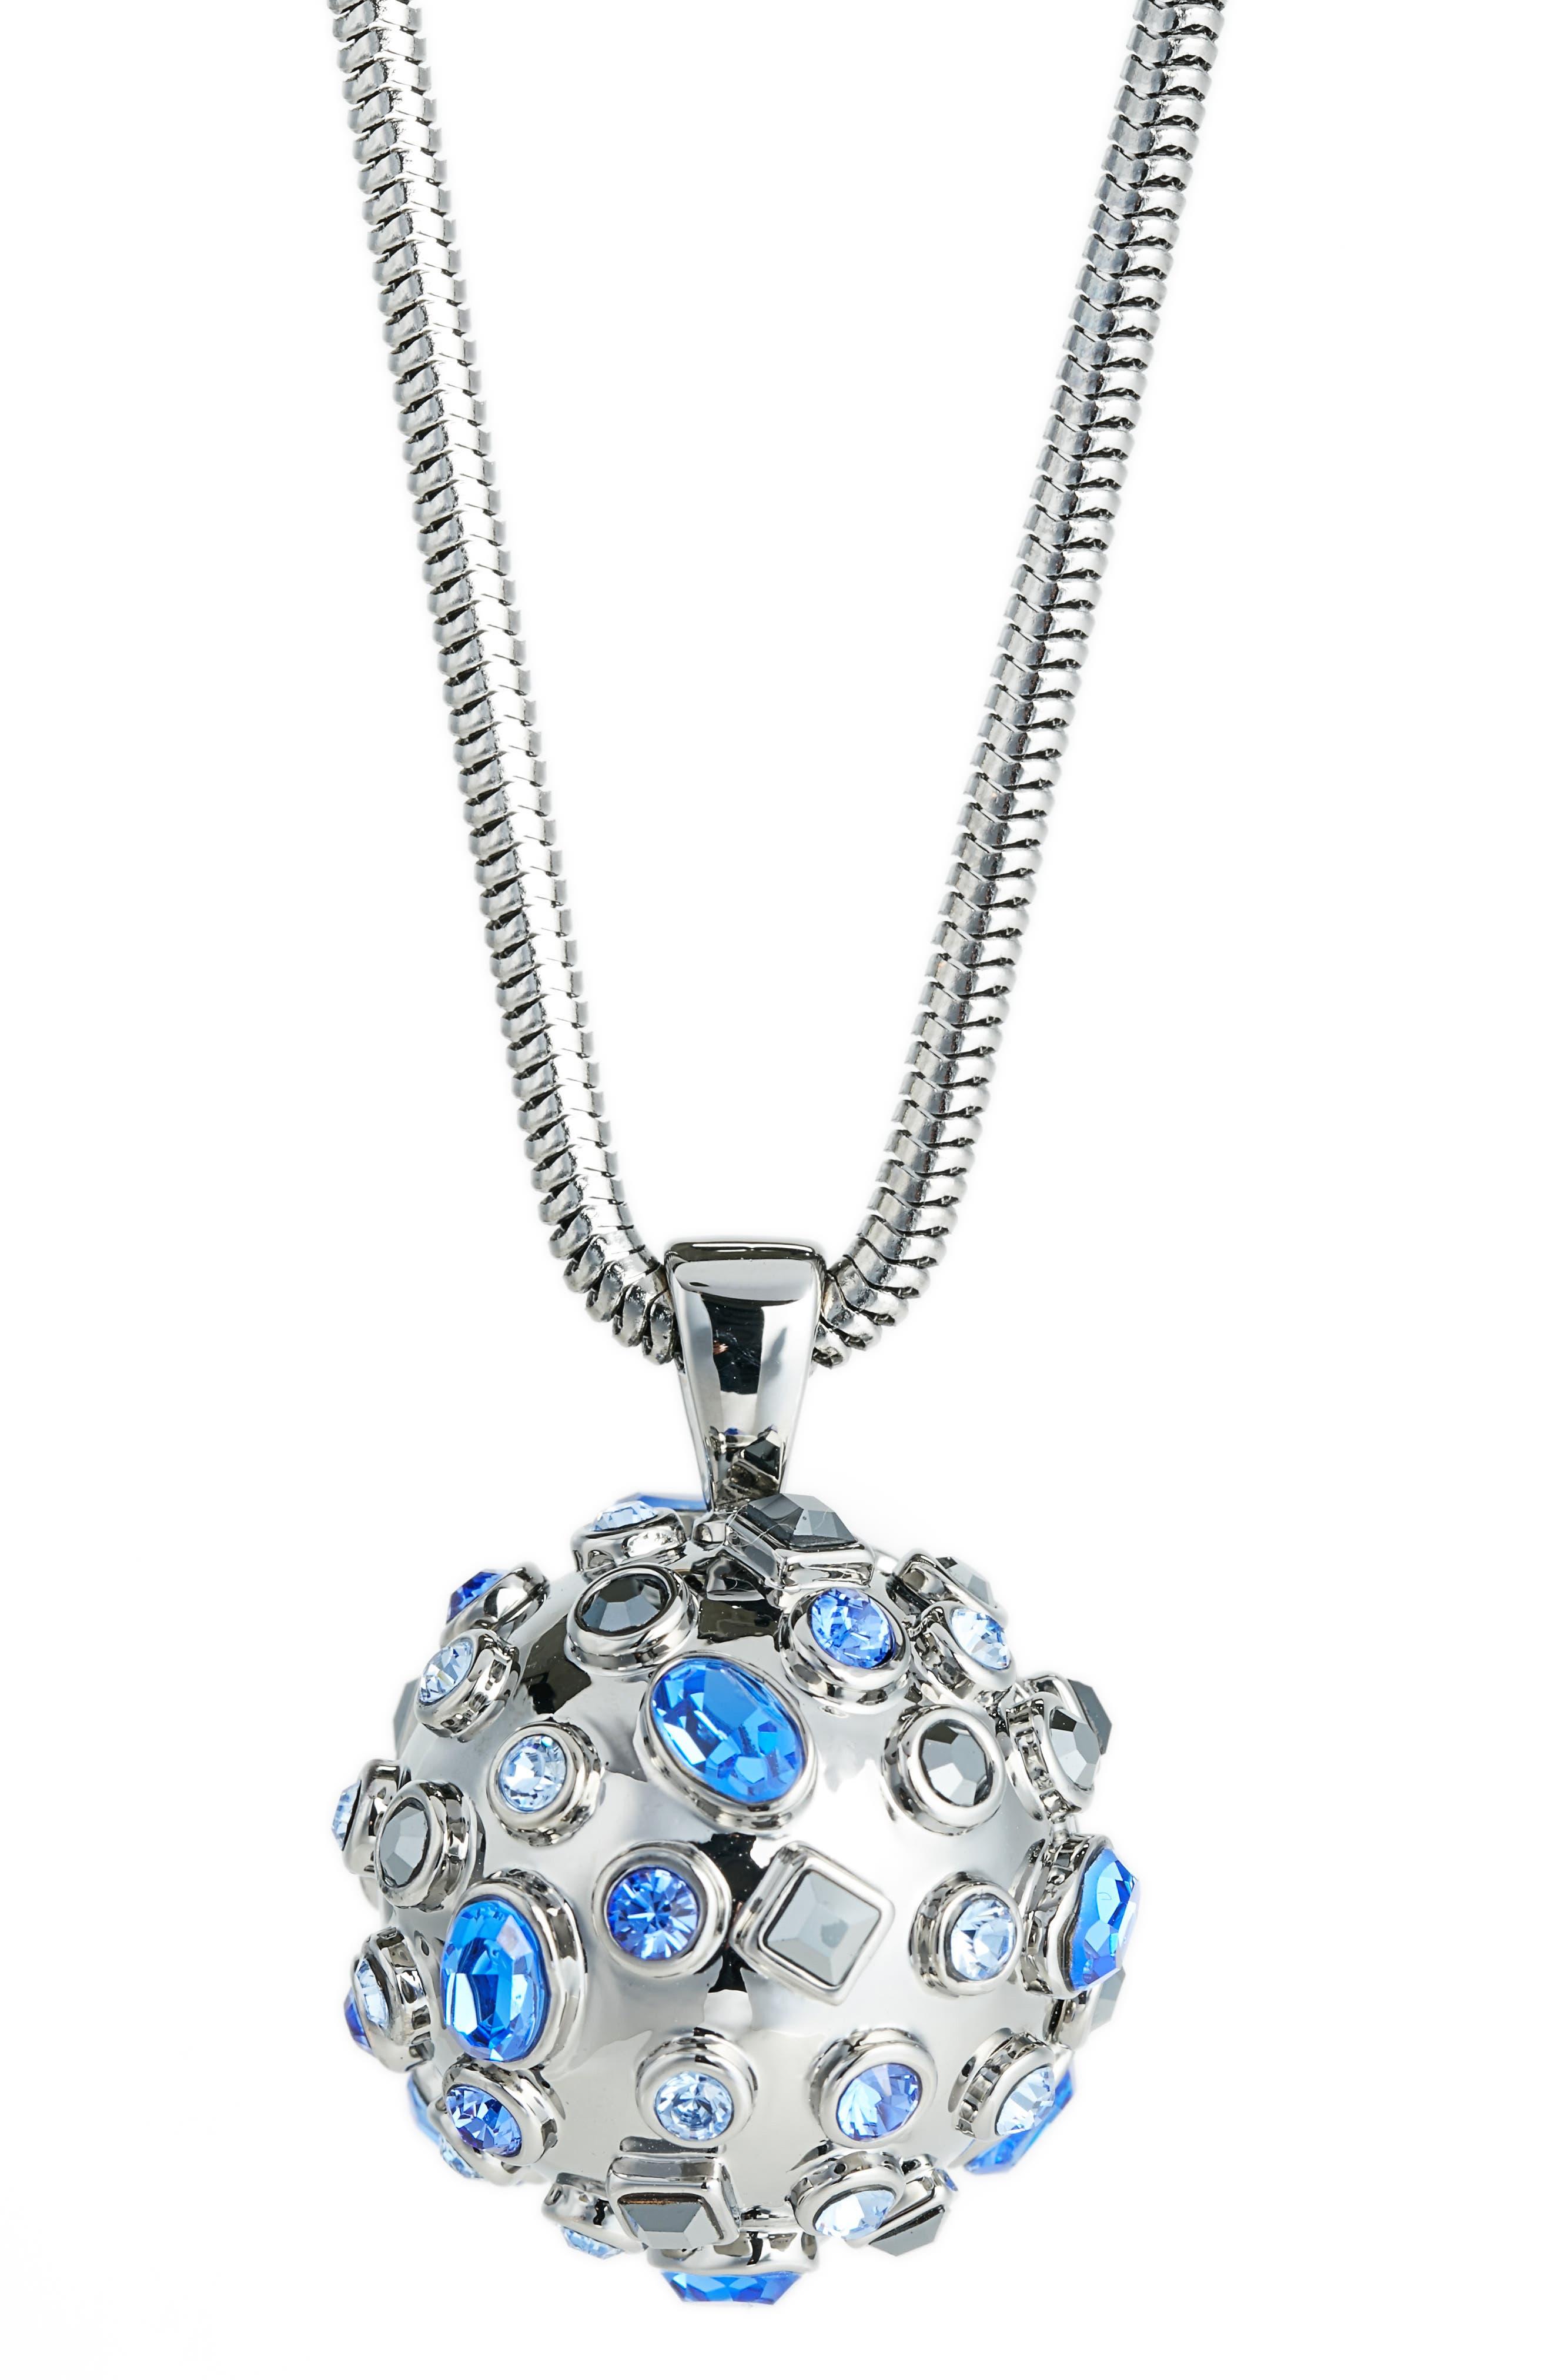 Swarovski Crystal Pendant Necklace,                             Main thumbnail 1, color,                             040